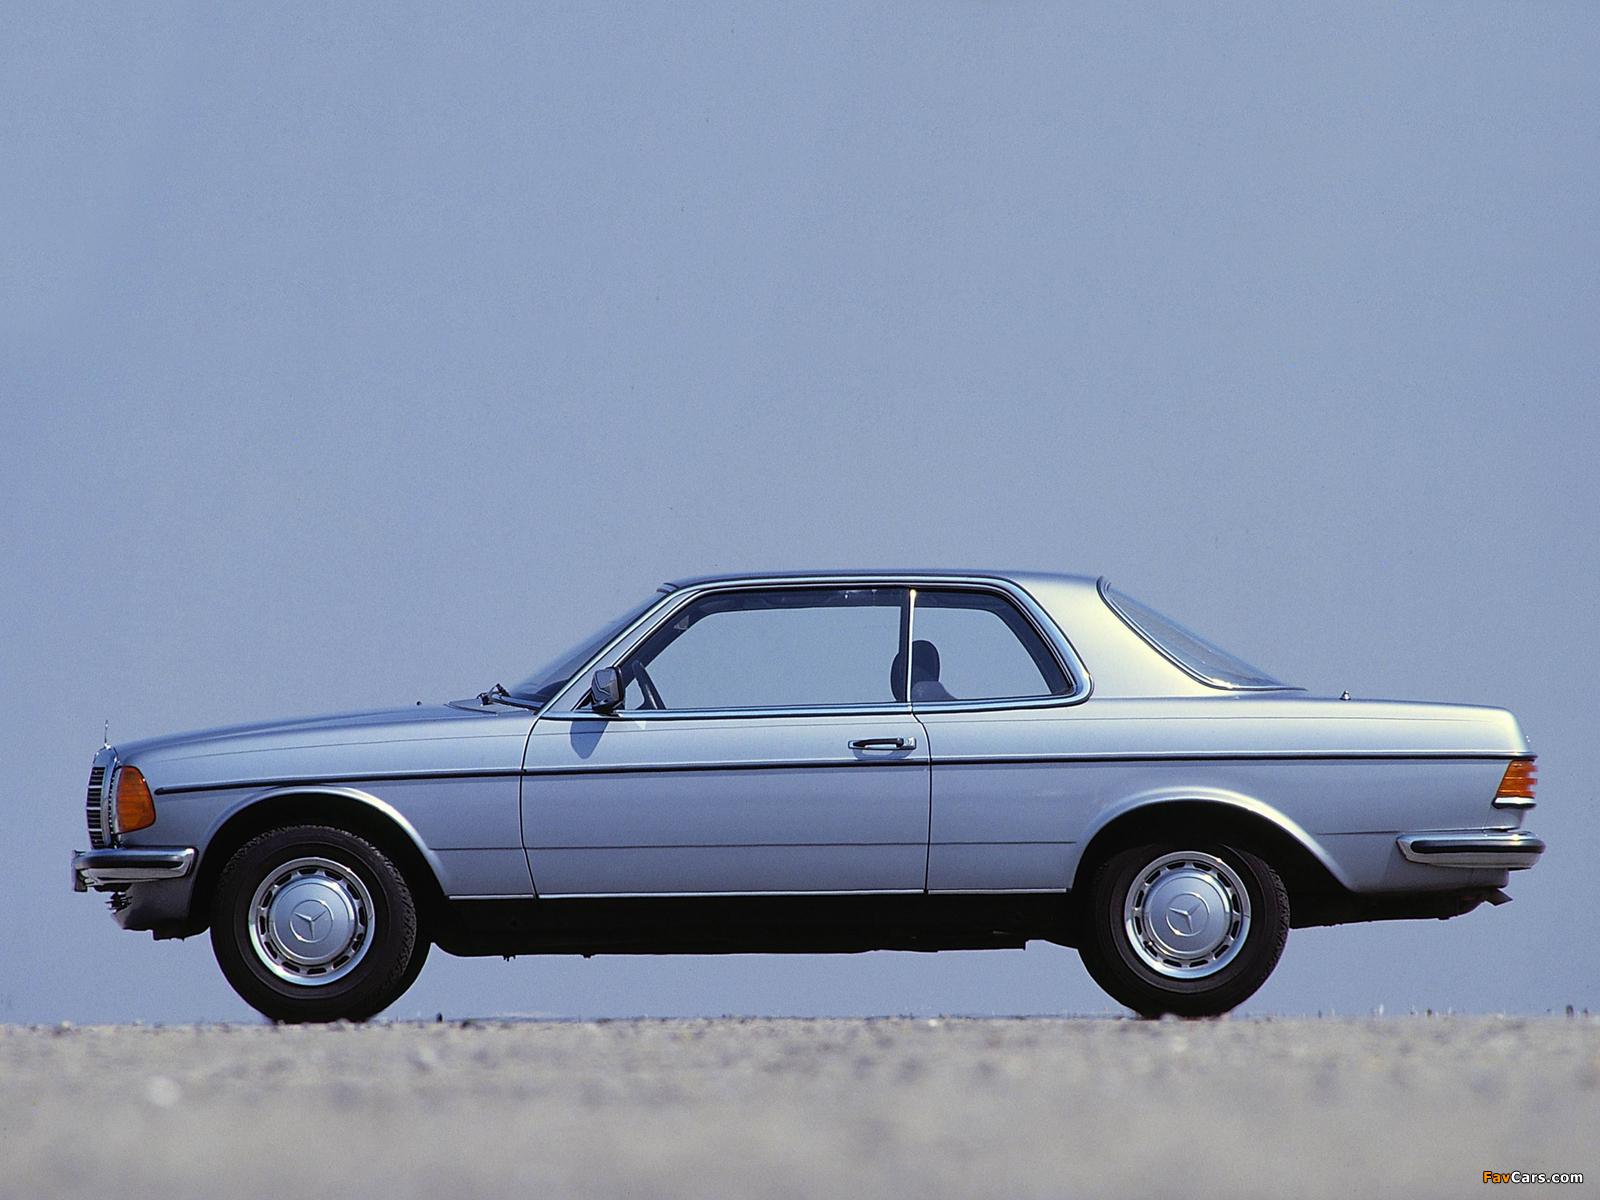 Mercedes benz e klasse coupe c123 1977 85 wallpapers for 85 mercedes benz